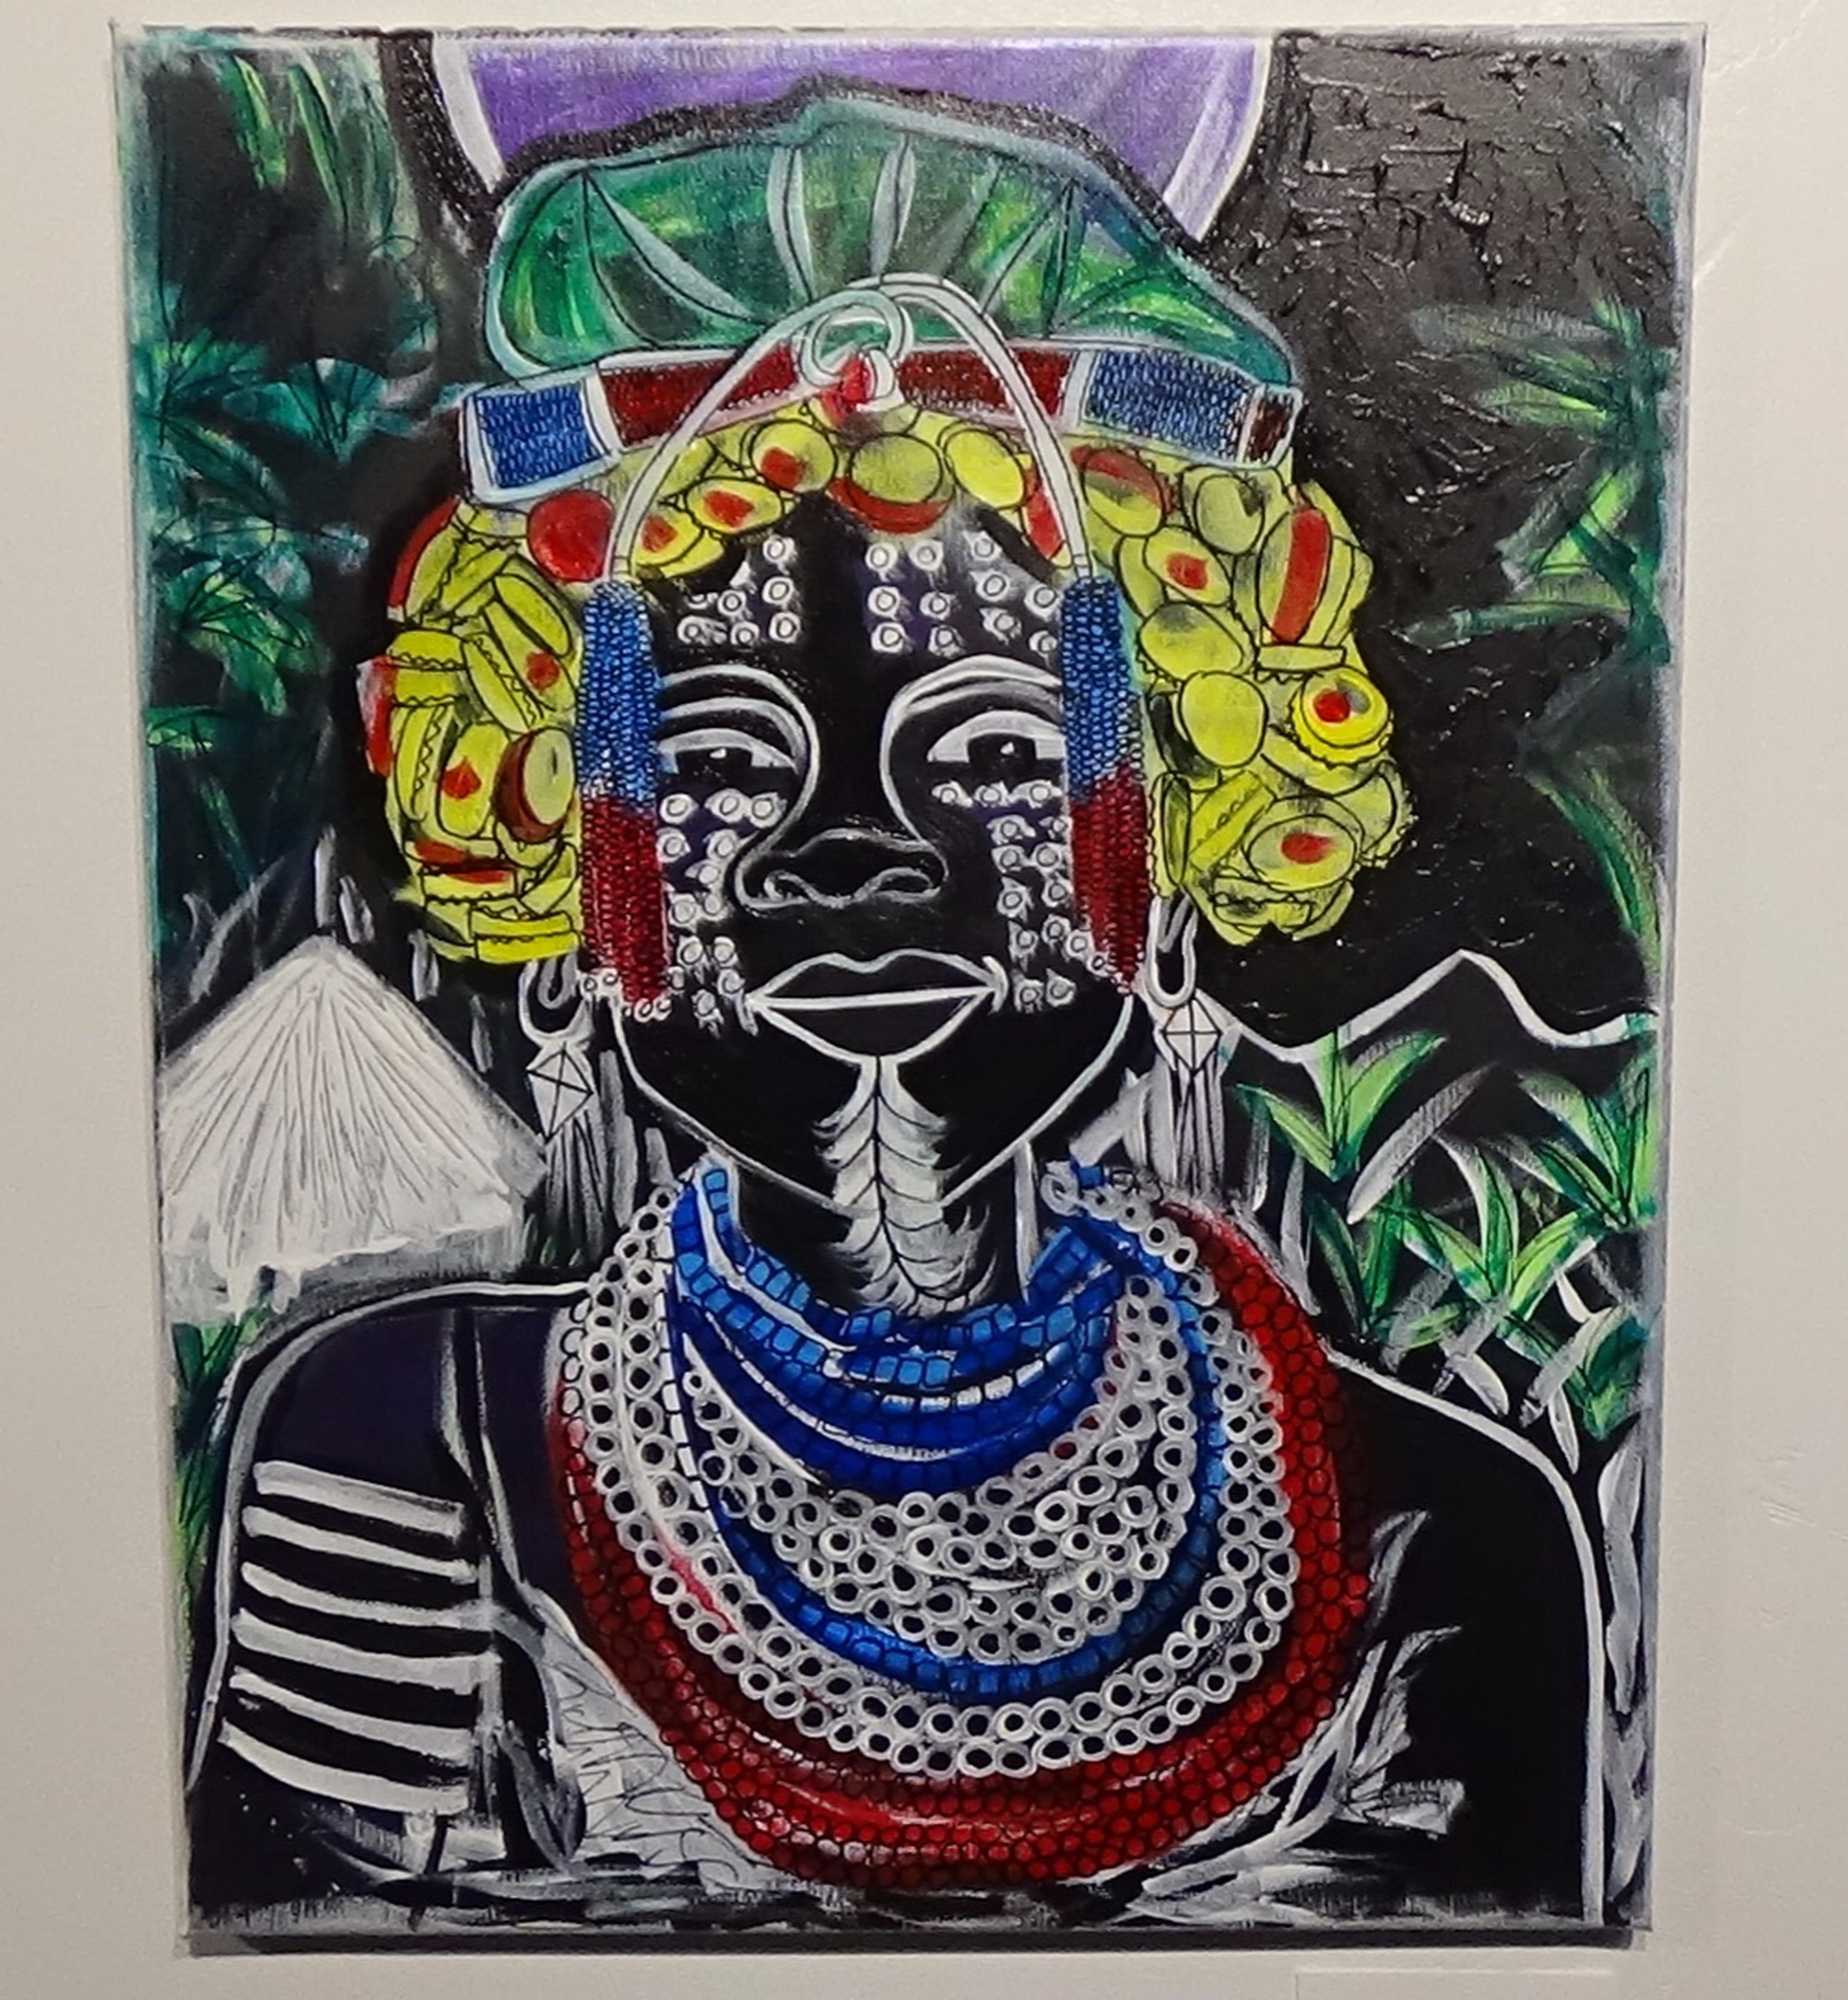 Beer Cap Wig by Flourish Galleria | ArtworkNetwork.com